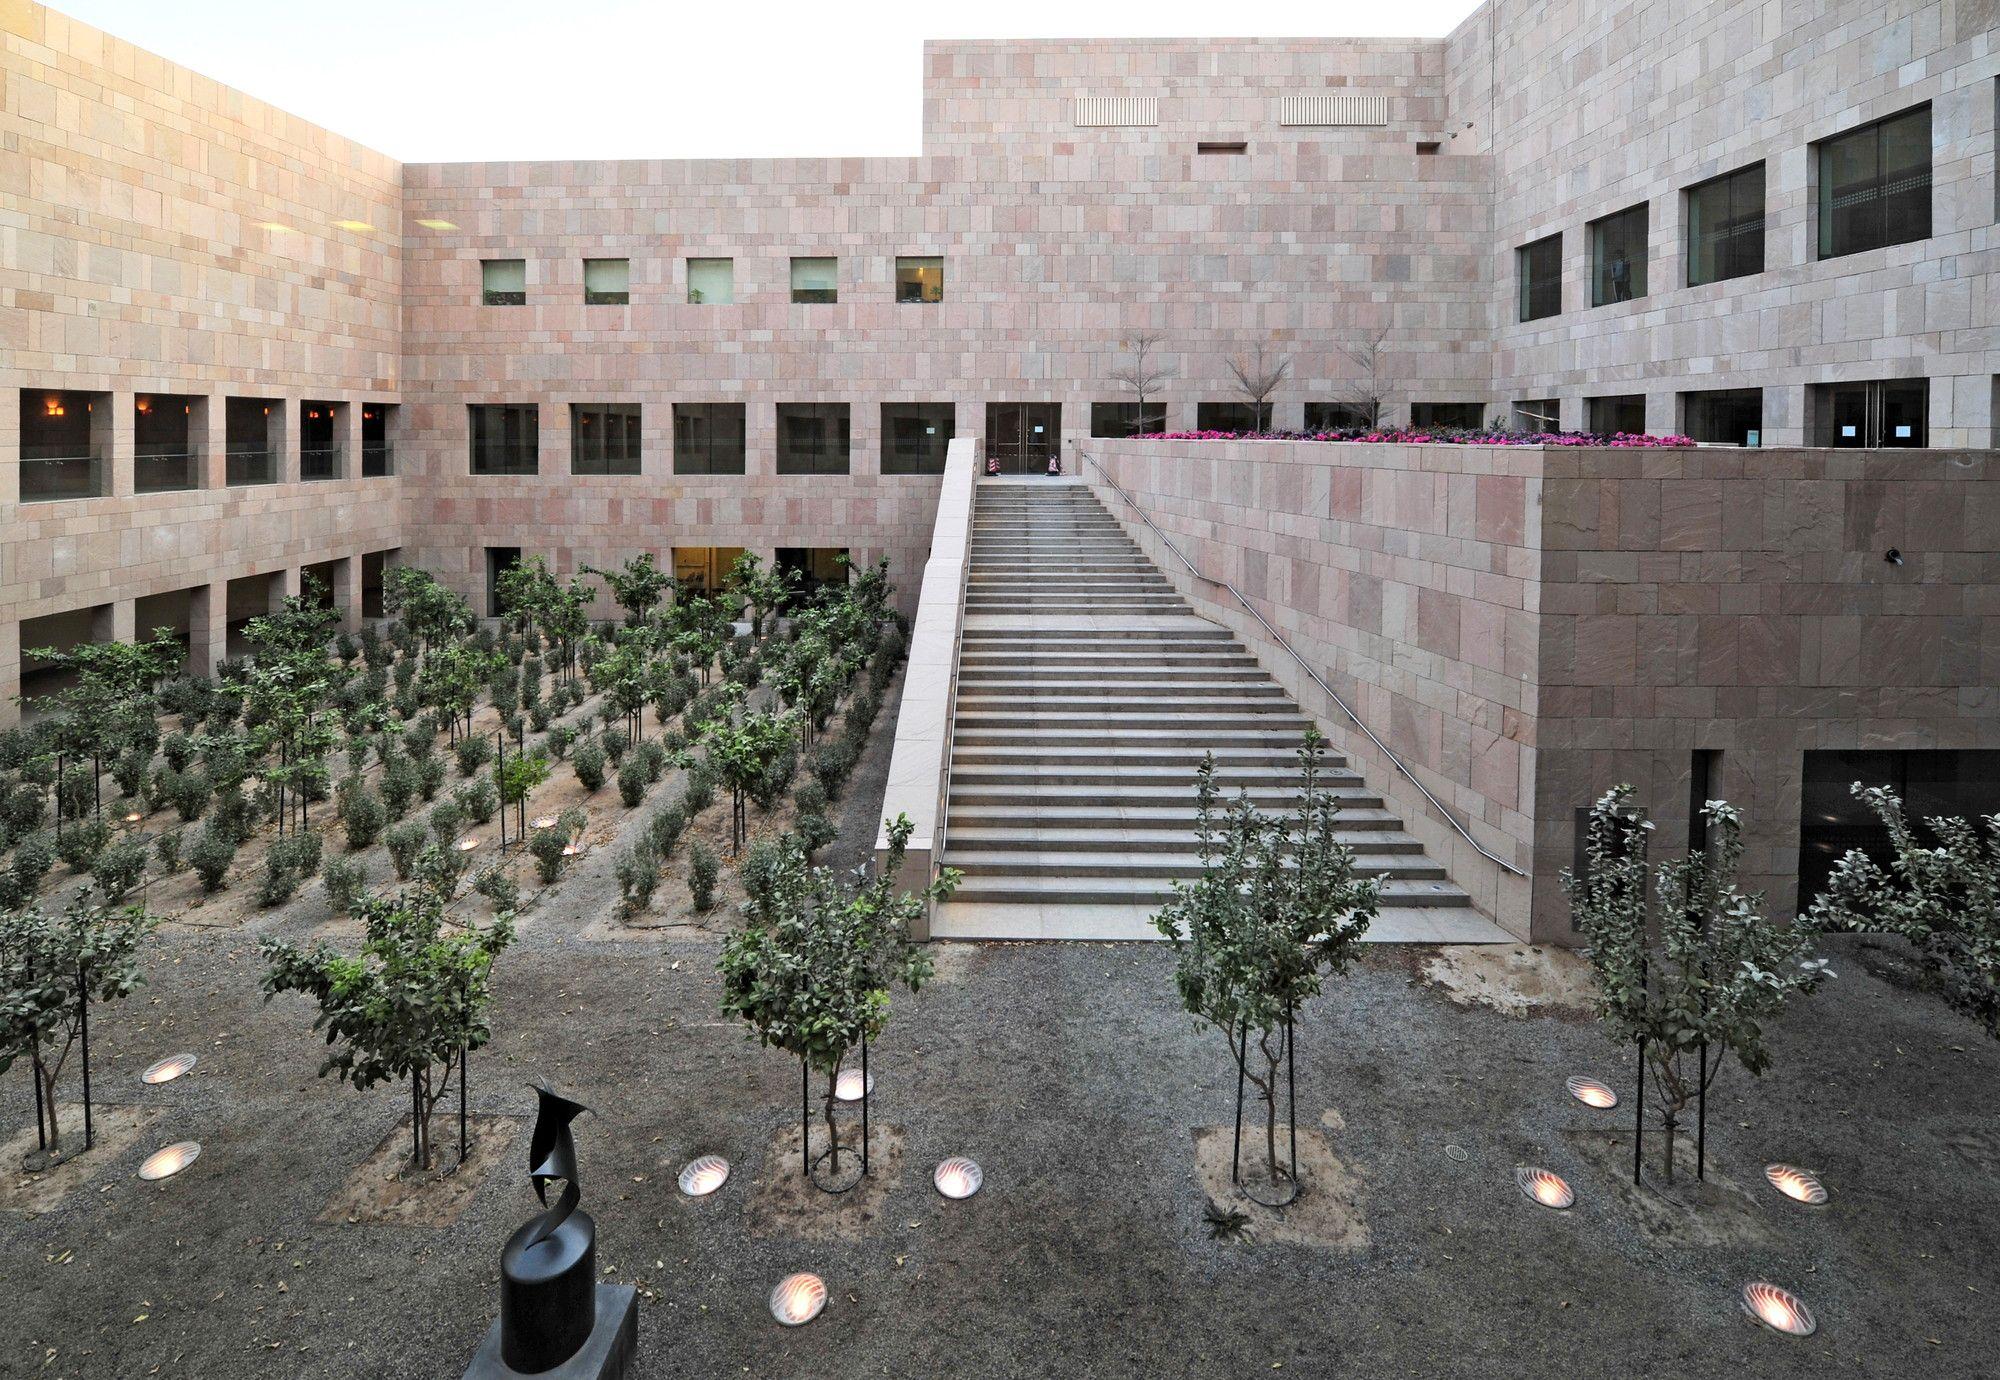 Gallery - Georgetown University School of Foreign Service / LEGORRETA + LEGORRETA - 10